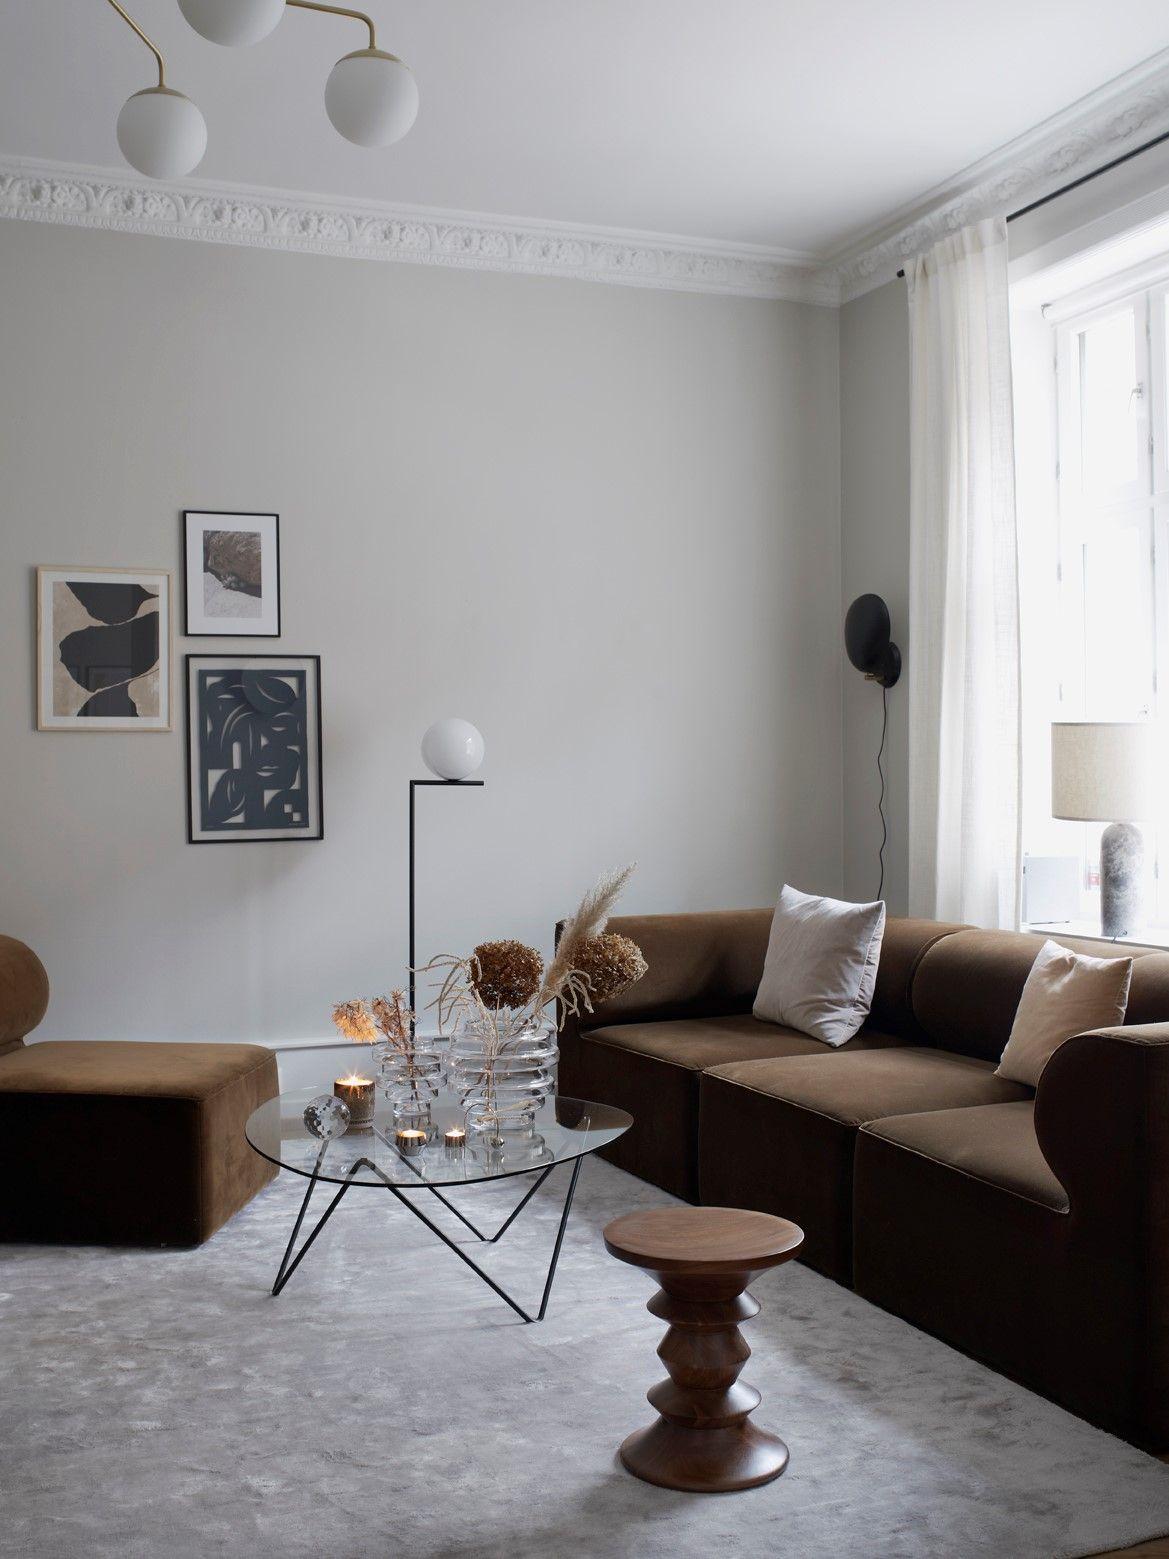 Menu Eave Modular Sofa Designed By Norm Architects Photograph Birgit Fauske Menuspace Modernismreimagin Modular Sofa Design Living Dining Room Home Decor